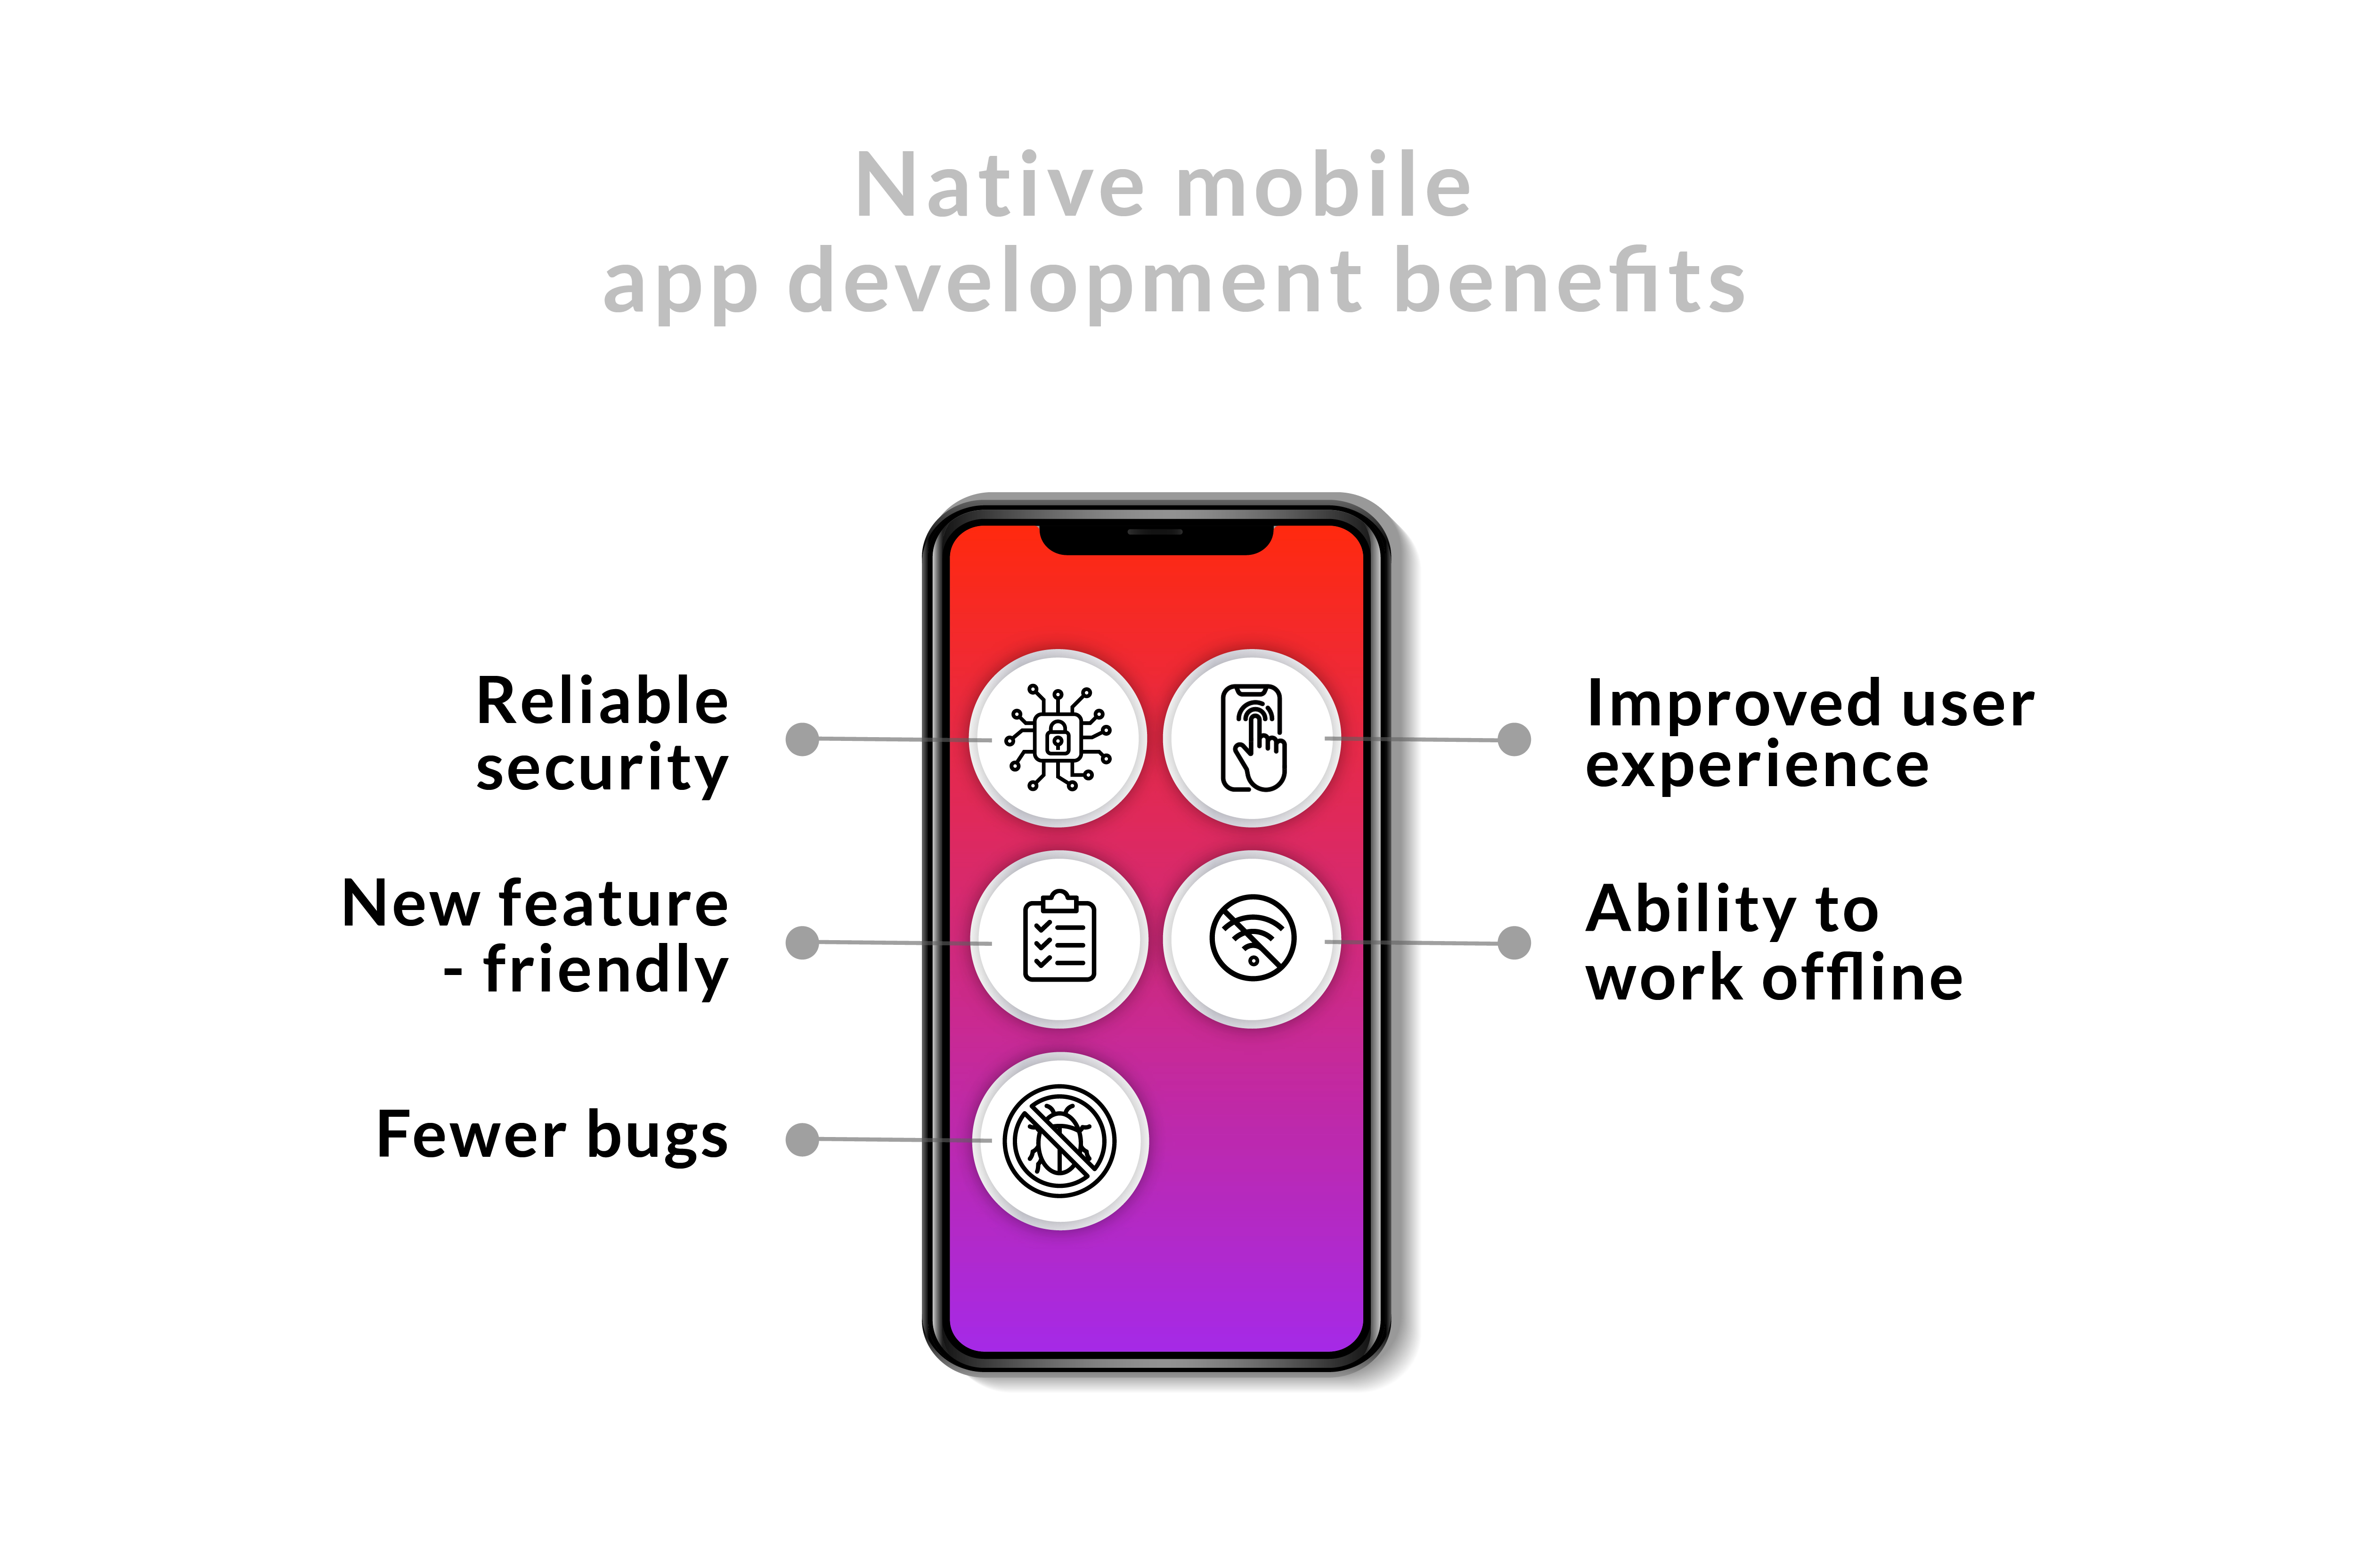 Native mobile app development benefits